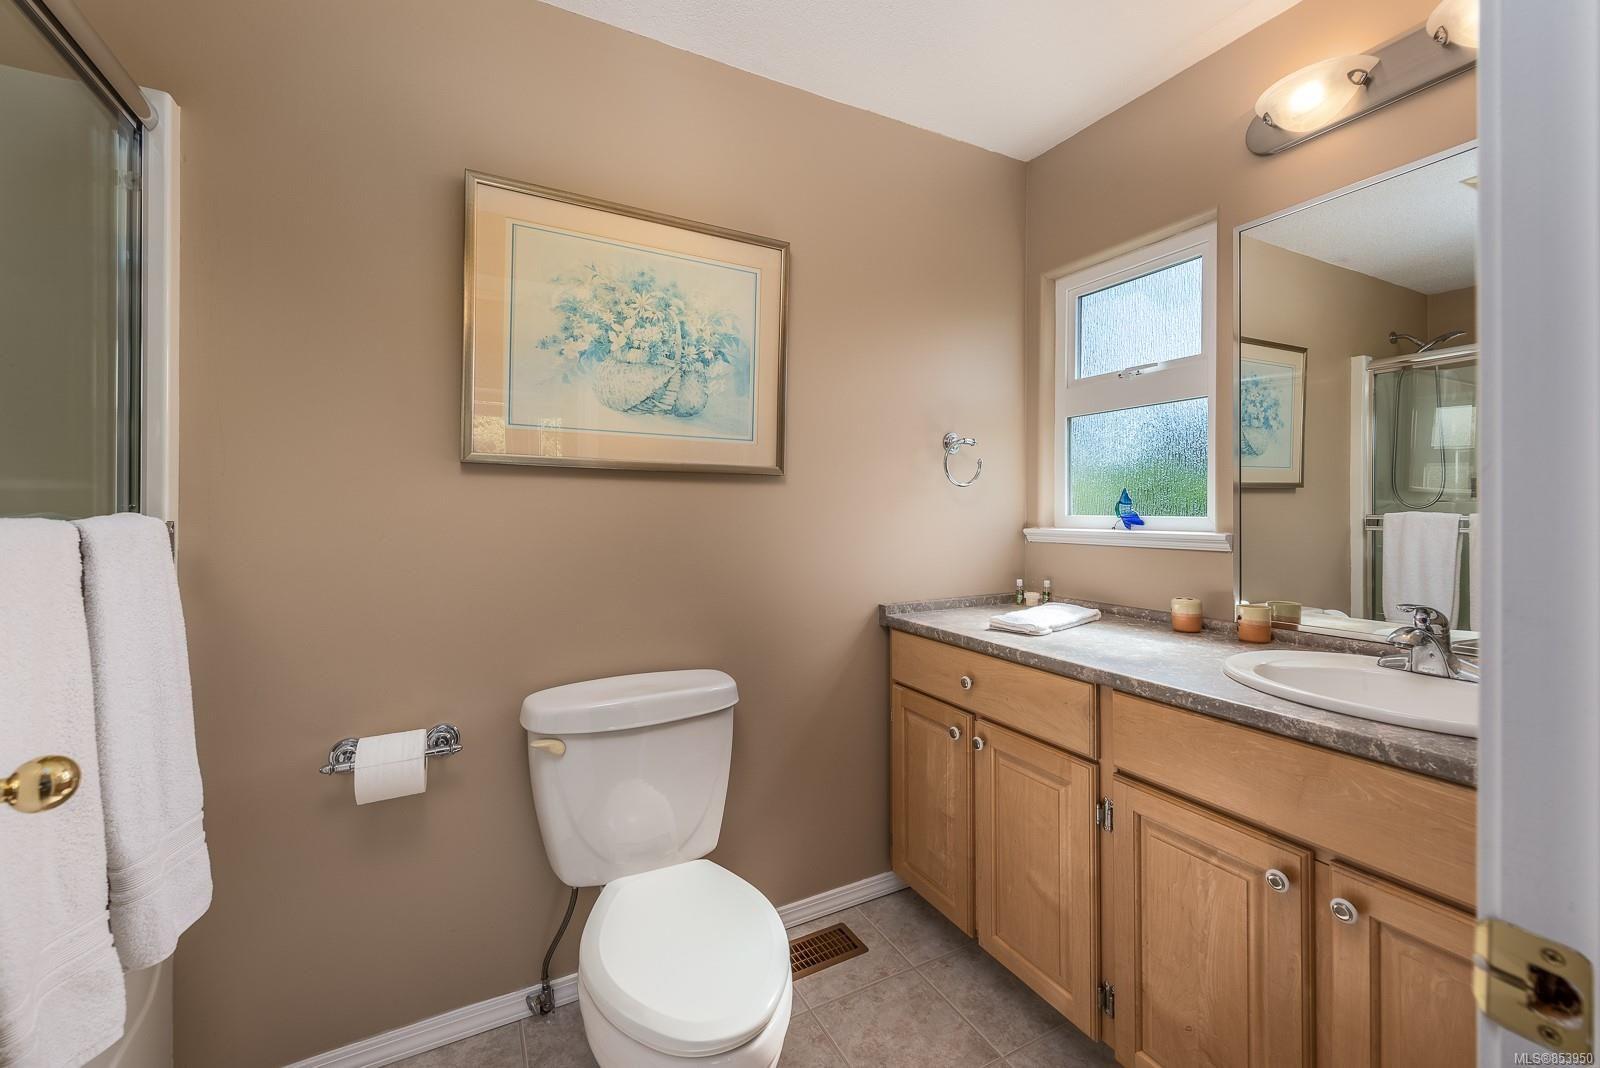 Photo 23: Photos: 5880 GARVIN Rd in : CV Union Bay/Fanny Bay House for sale (Comox Valley)  : MLS®# 853950